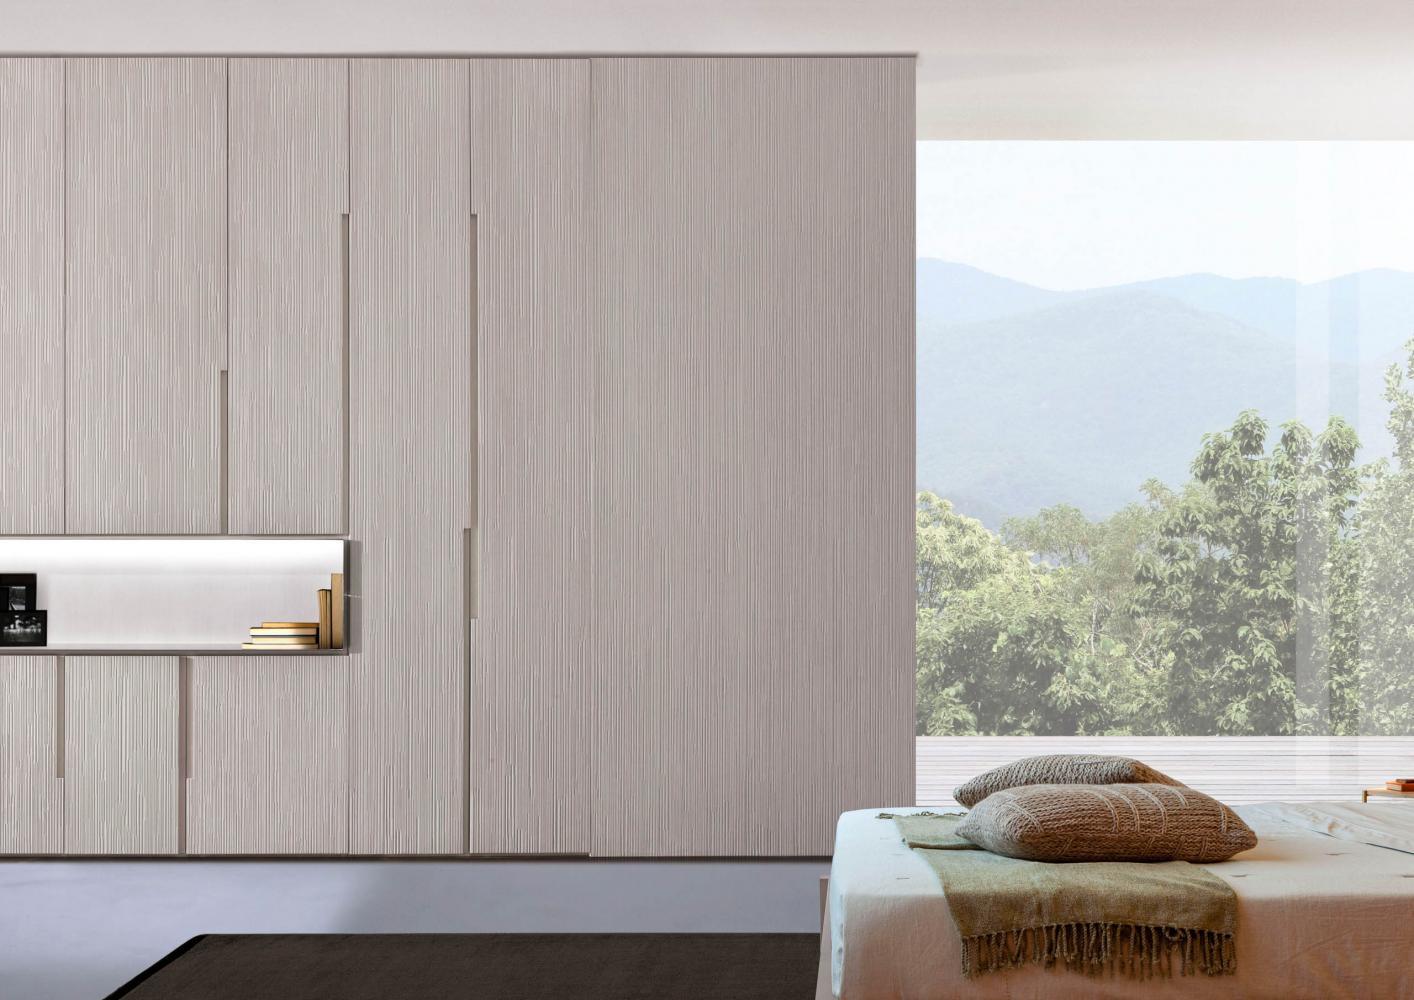 Decor custom made wooden luxury wardrobe with textured hinged doors